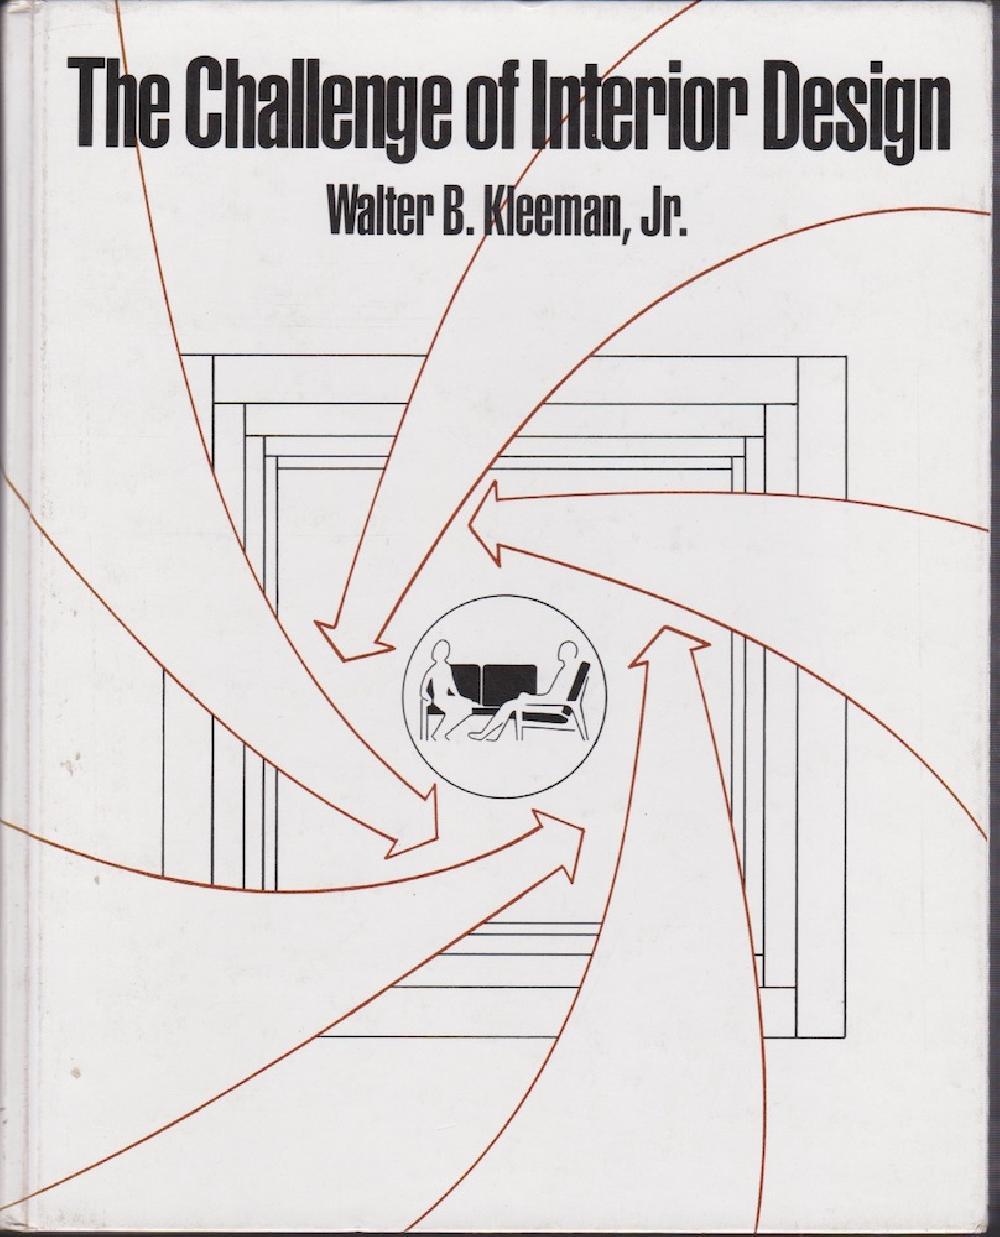 The challenge of interior design